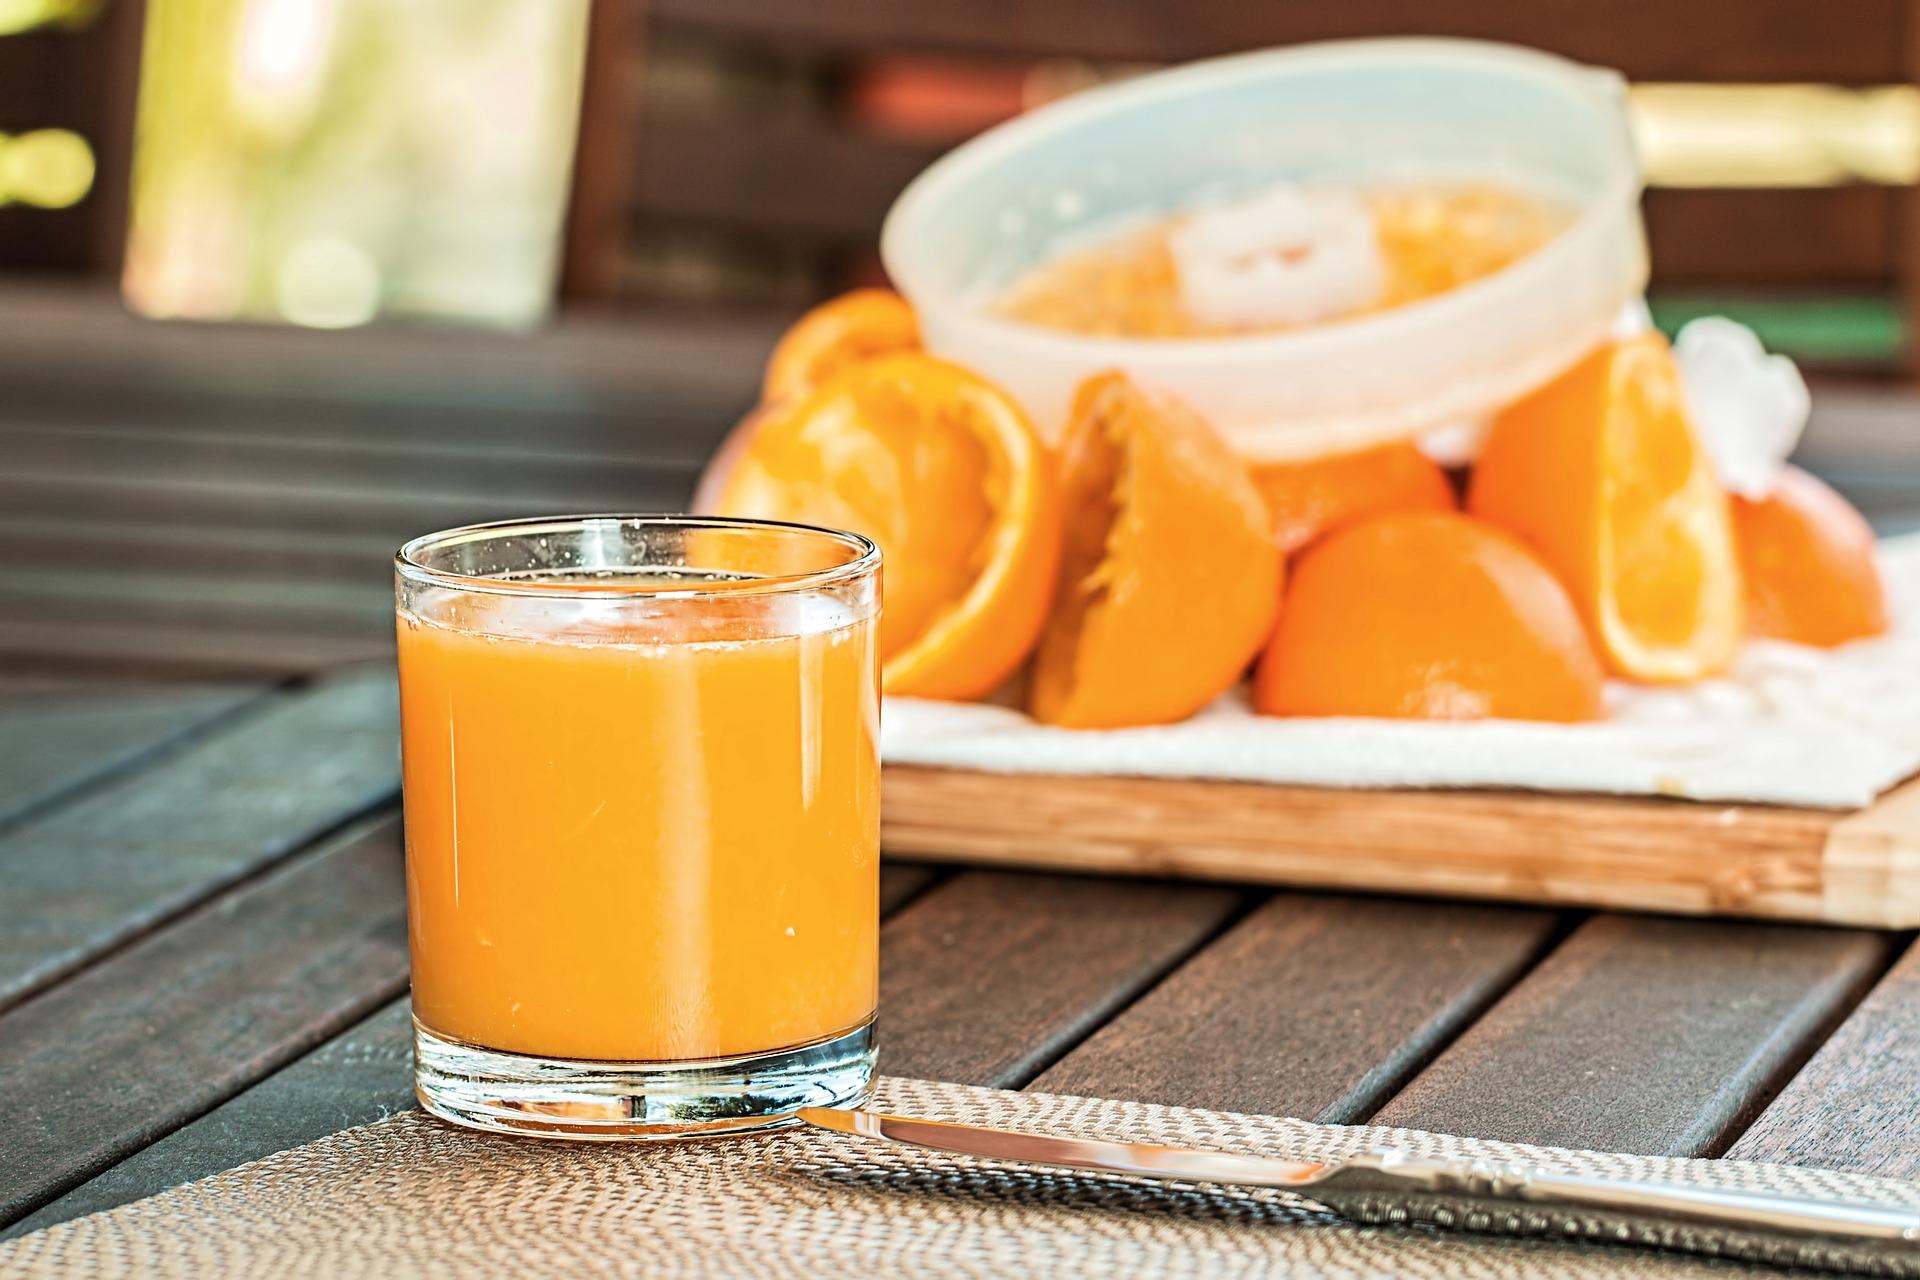 fruit juice full of sugar weight loss